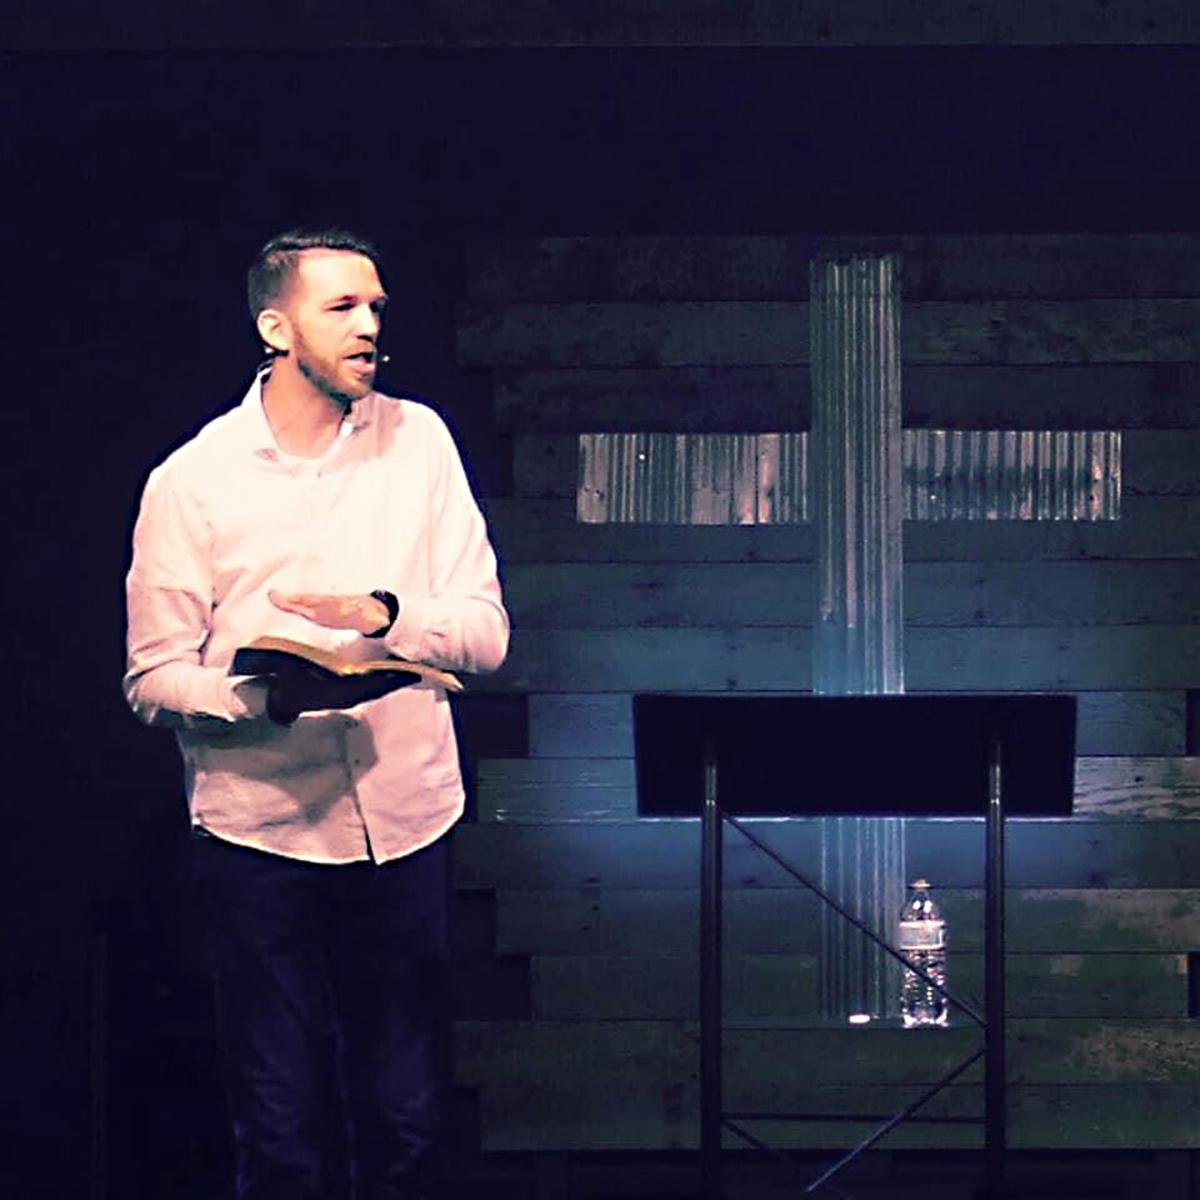 Pastor JJ preaching